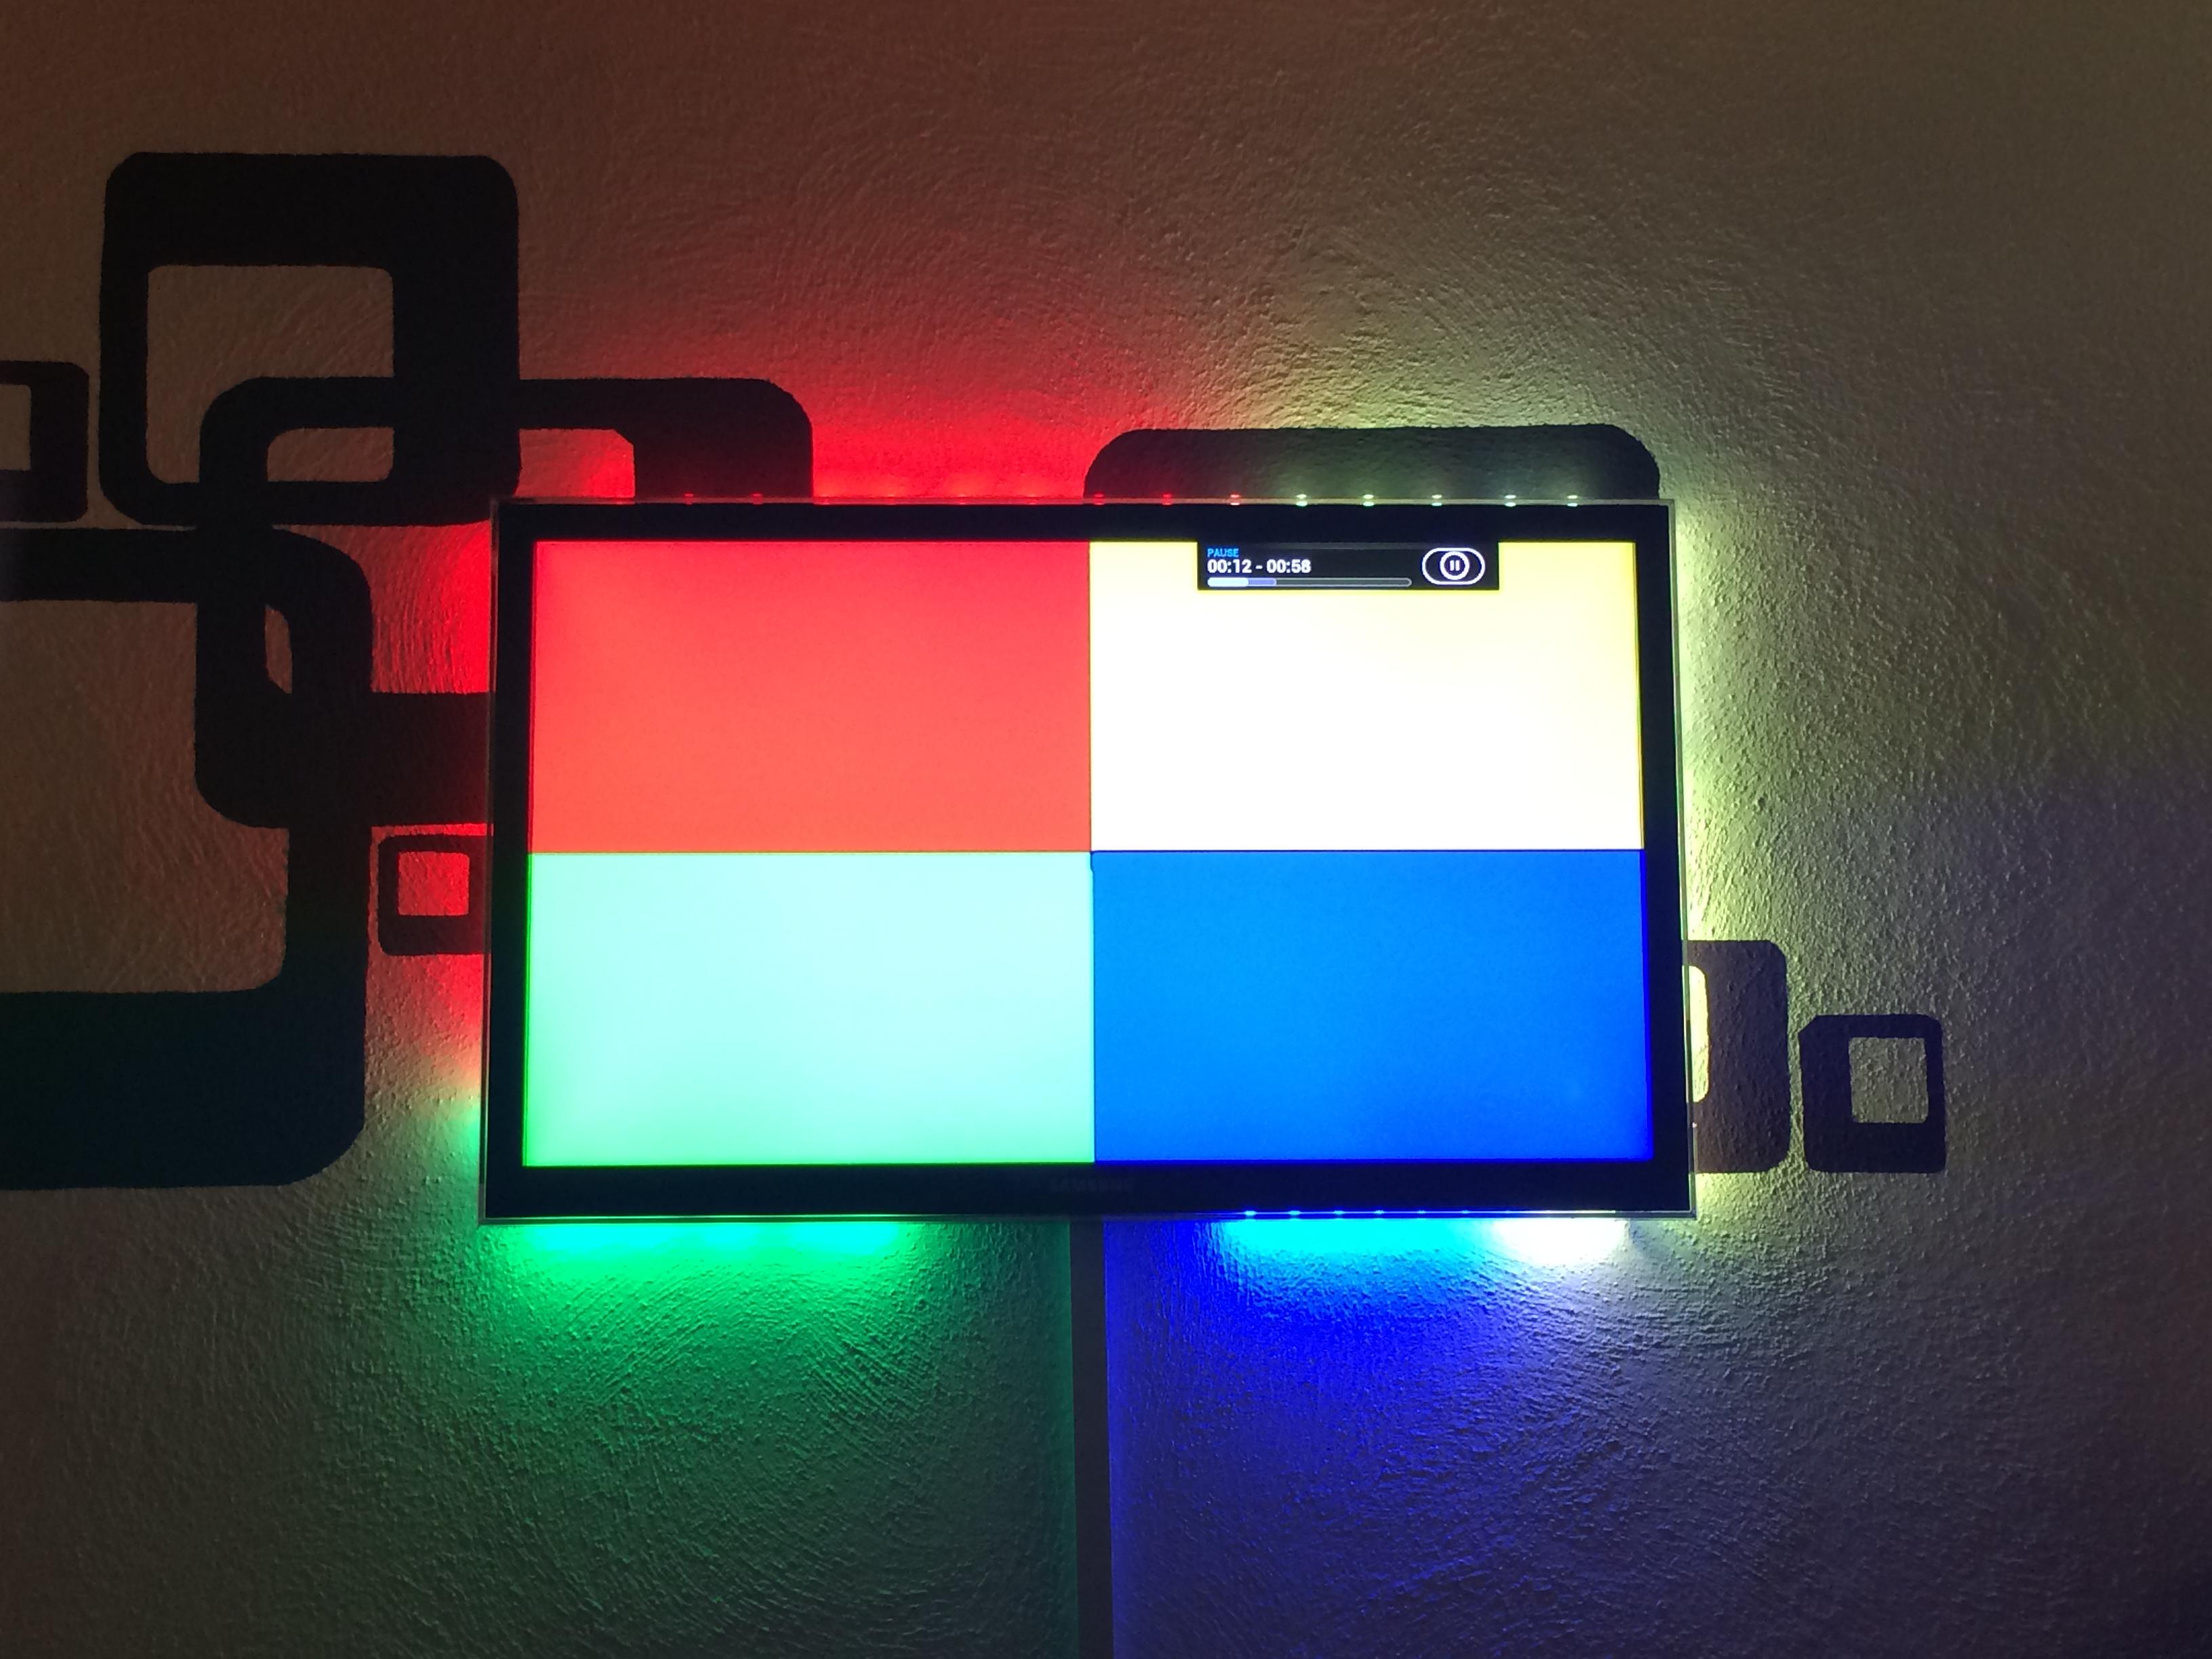 Setting Up Boblight With A Raspberry Pi And Raspbmc